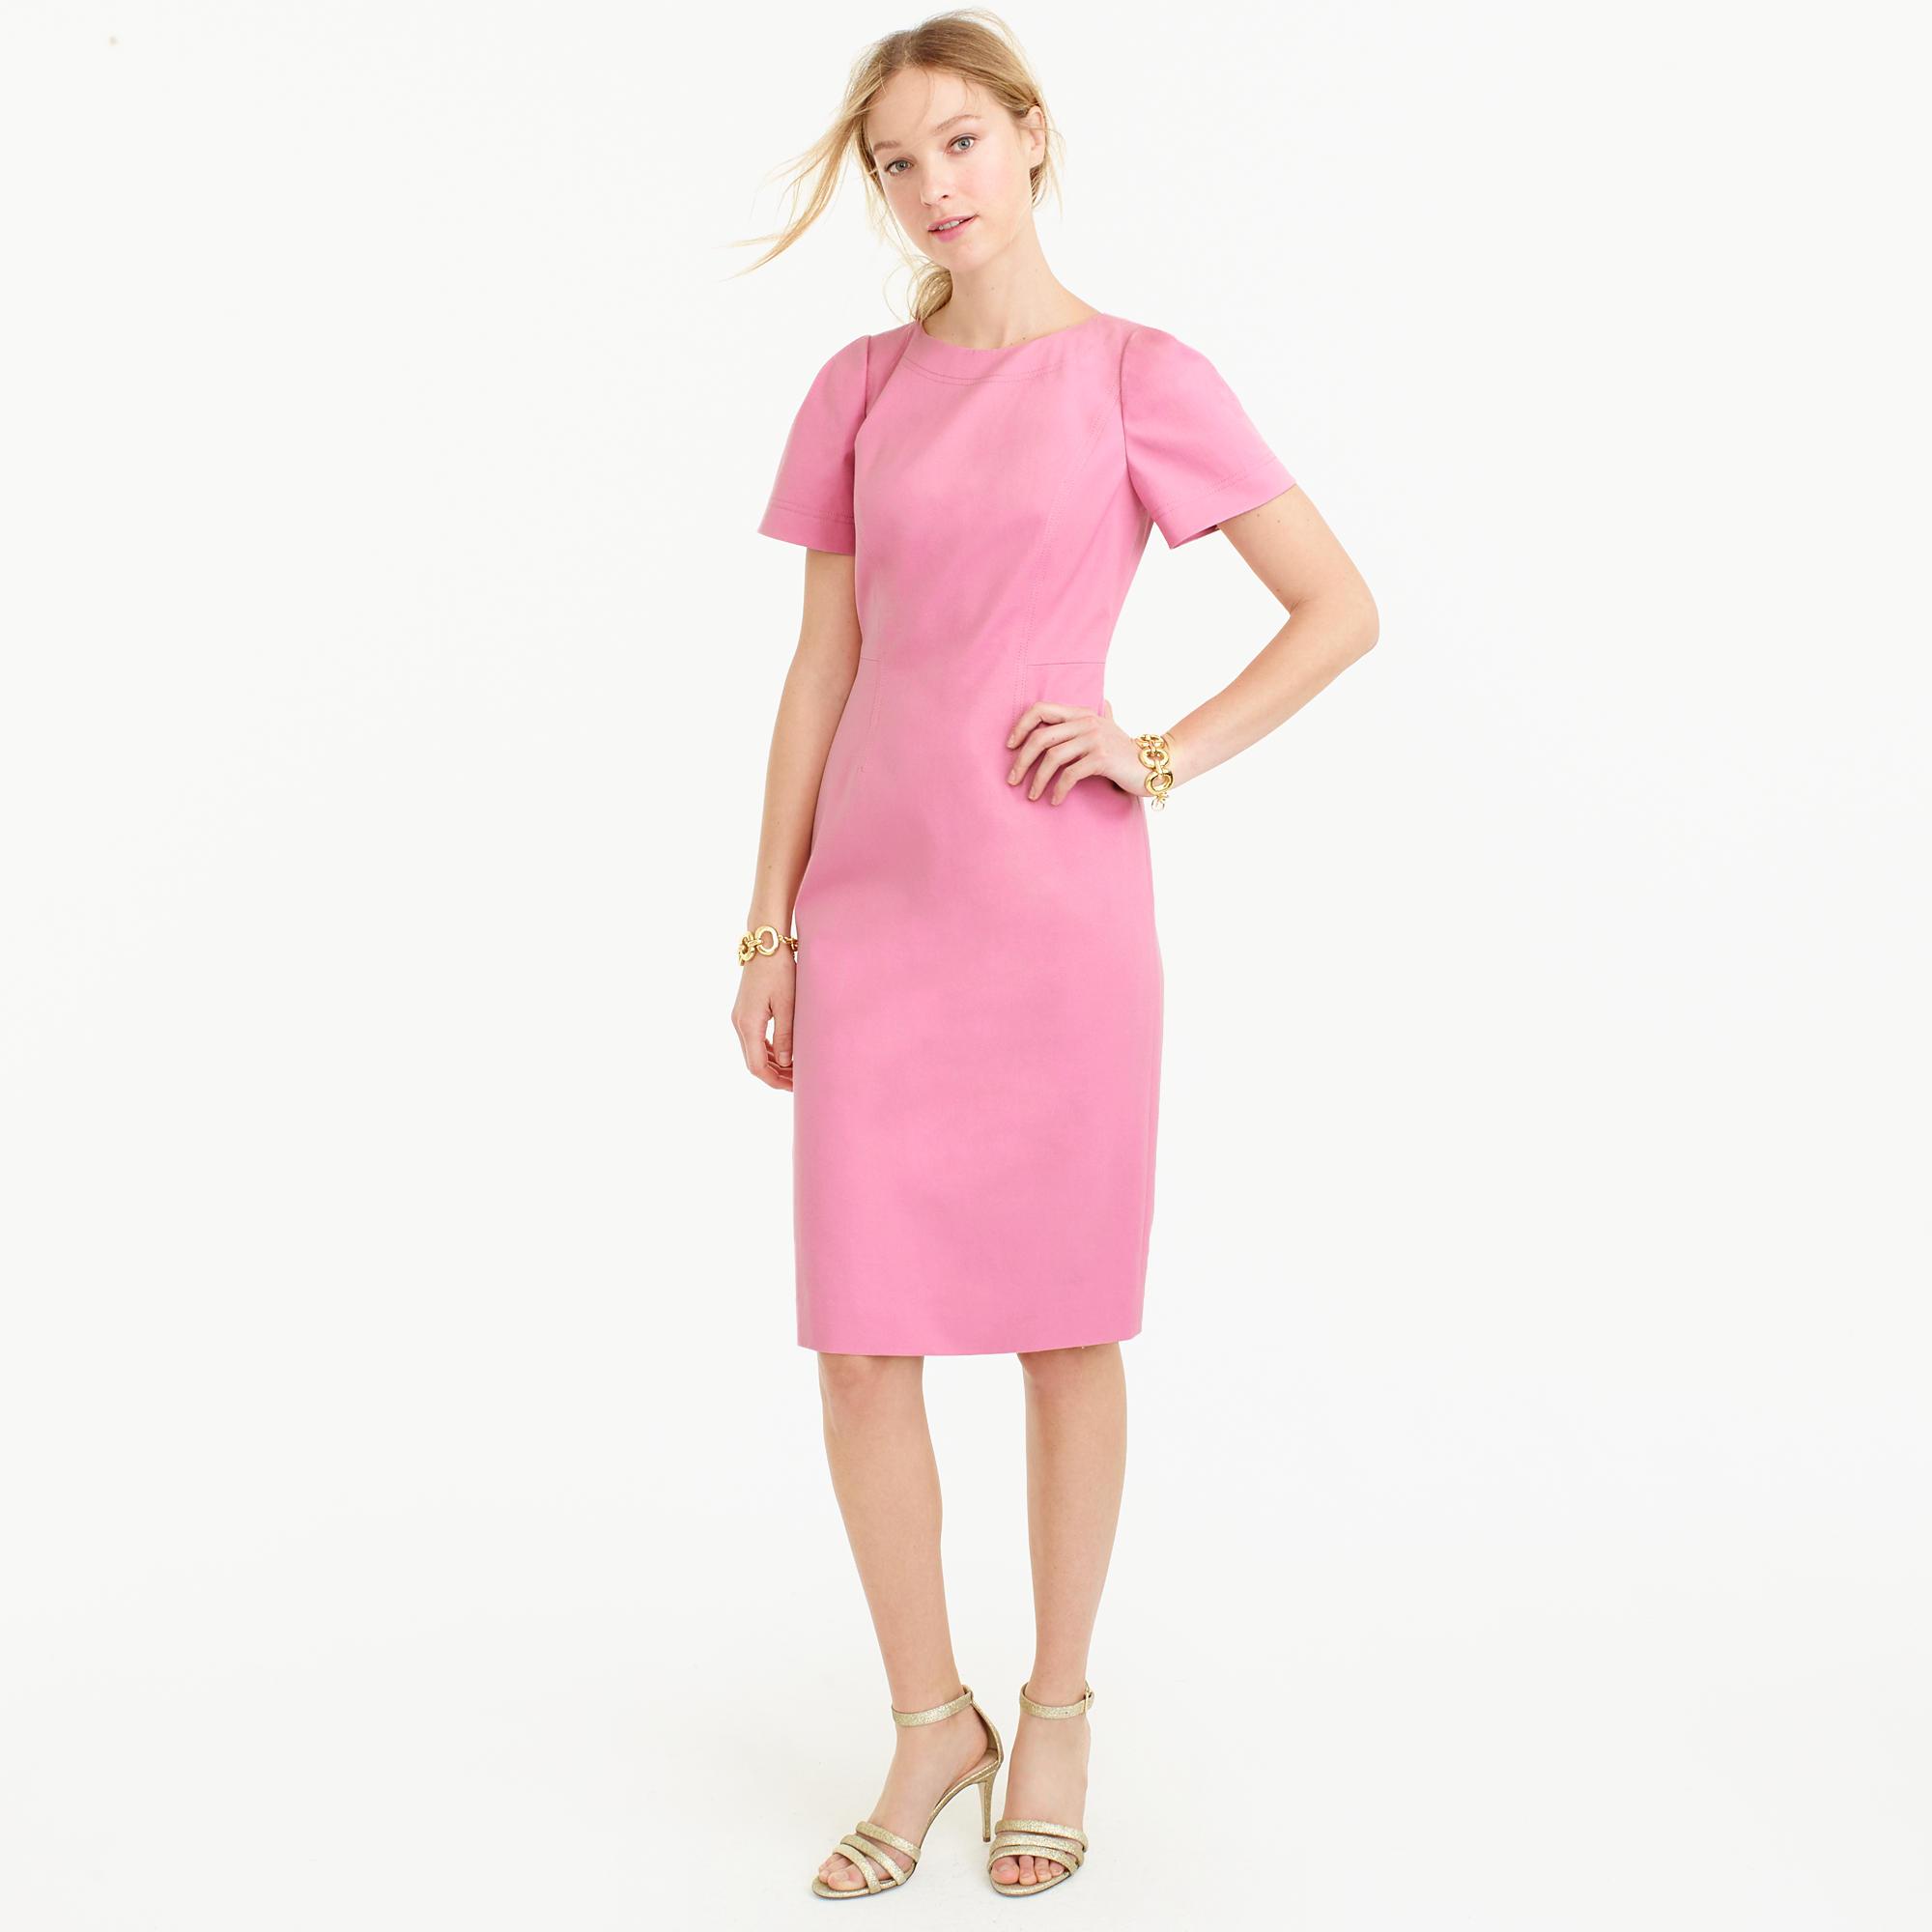 women s work apparel women s wear to work clothing j crew quick shop